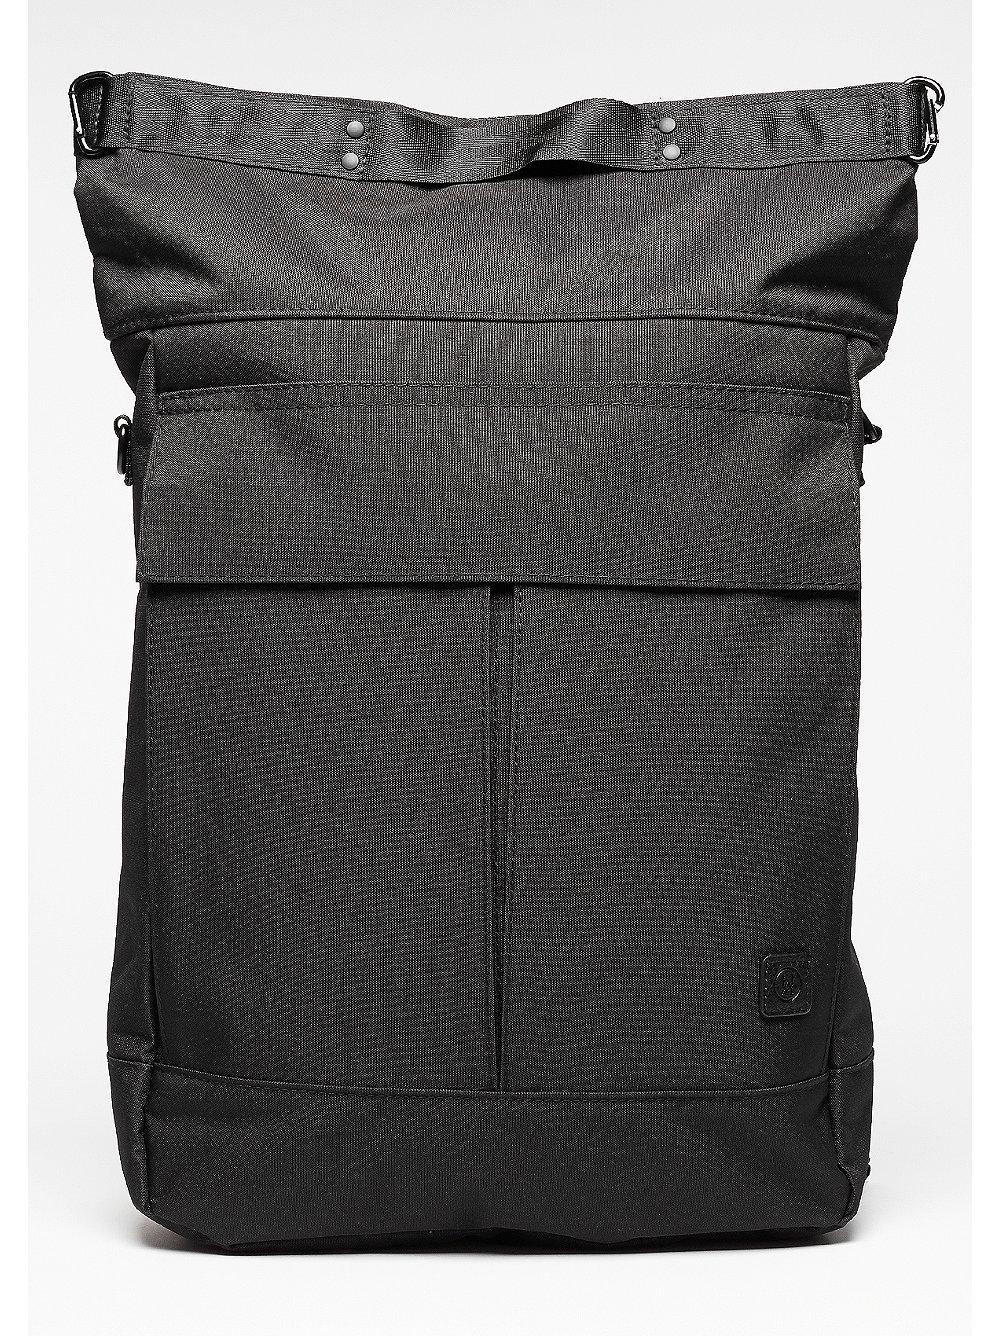 ucon acrobatics rucksack declan black bei snipes bestellen. Black Bedroom Furniture Sets. Home Design Ideas